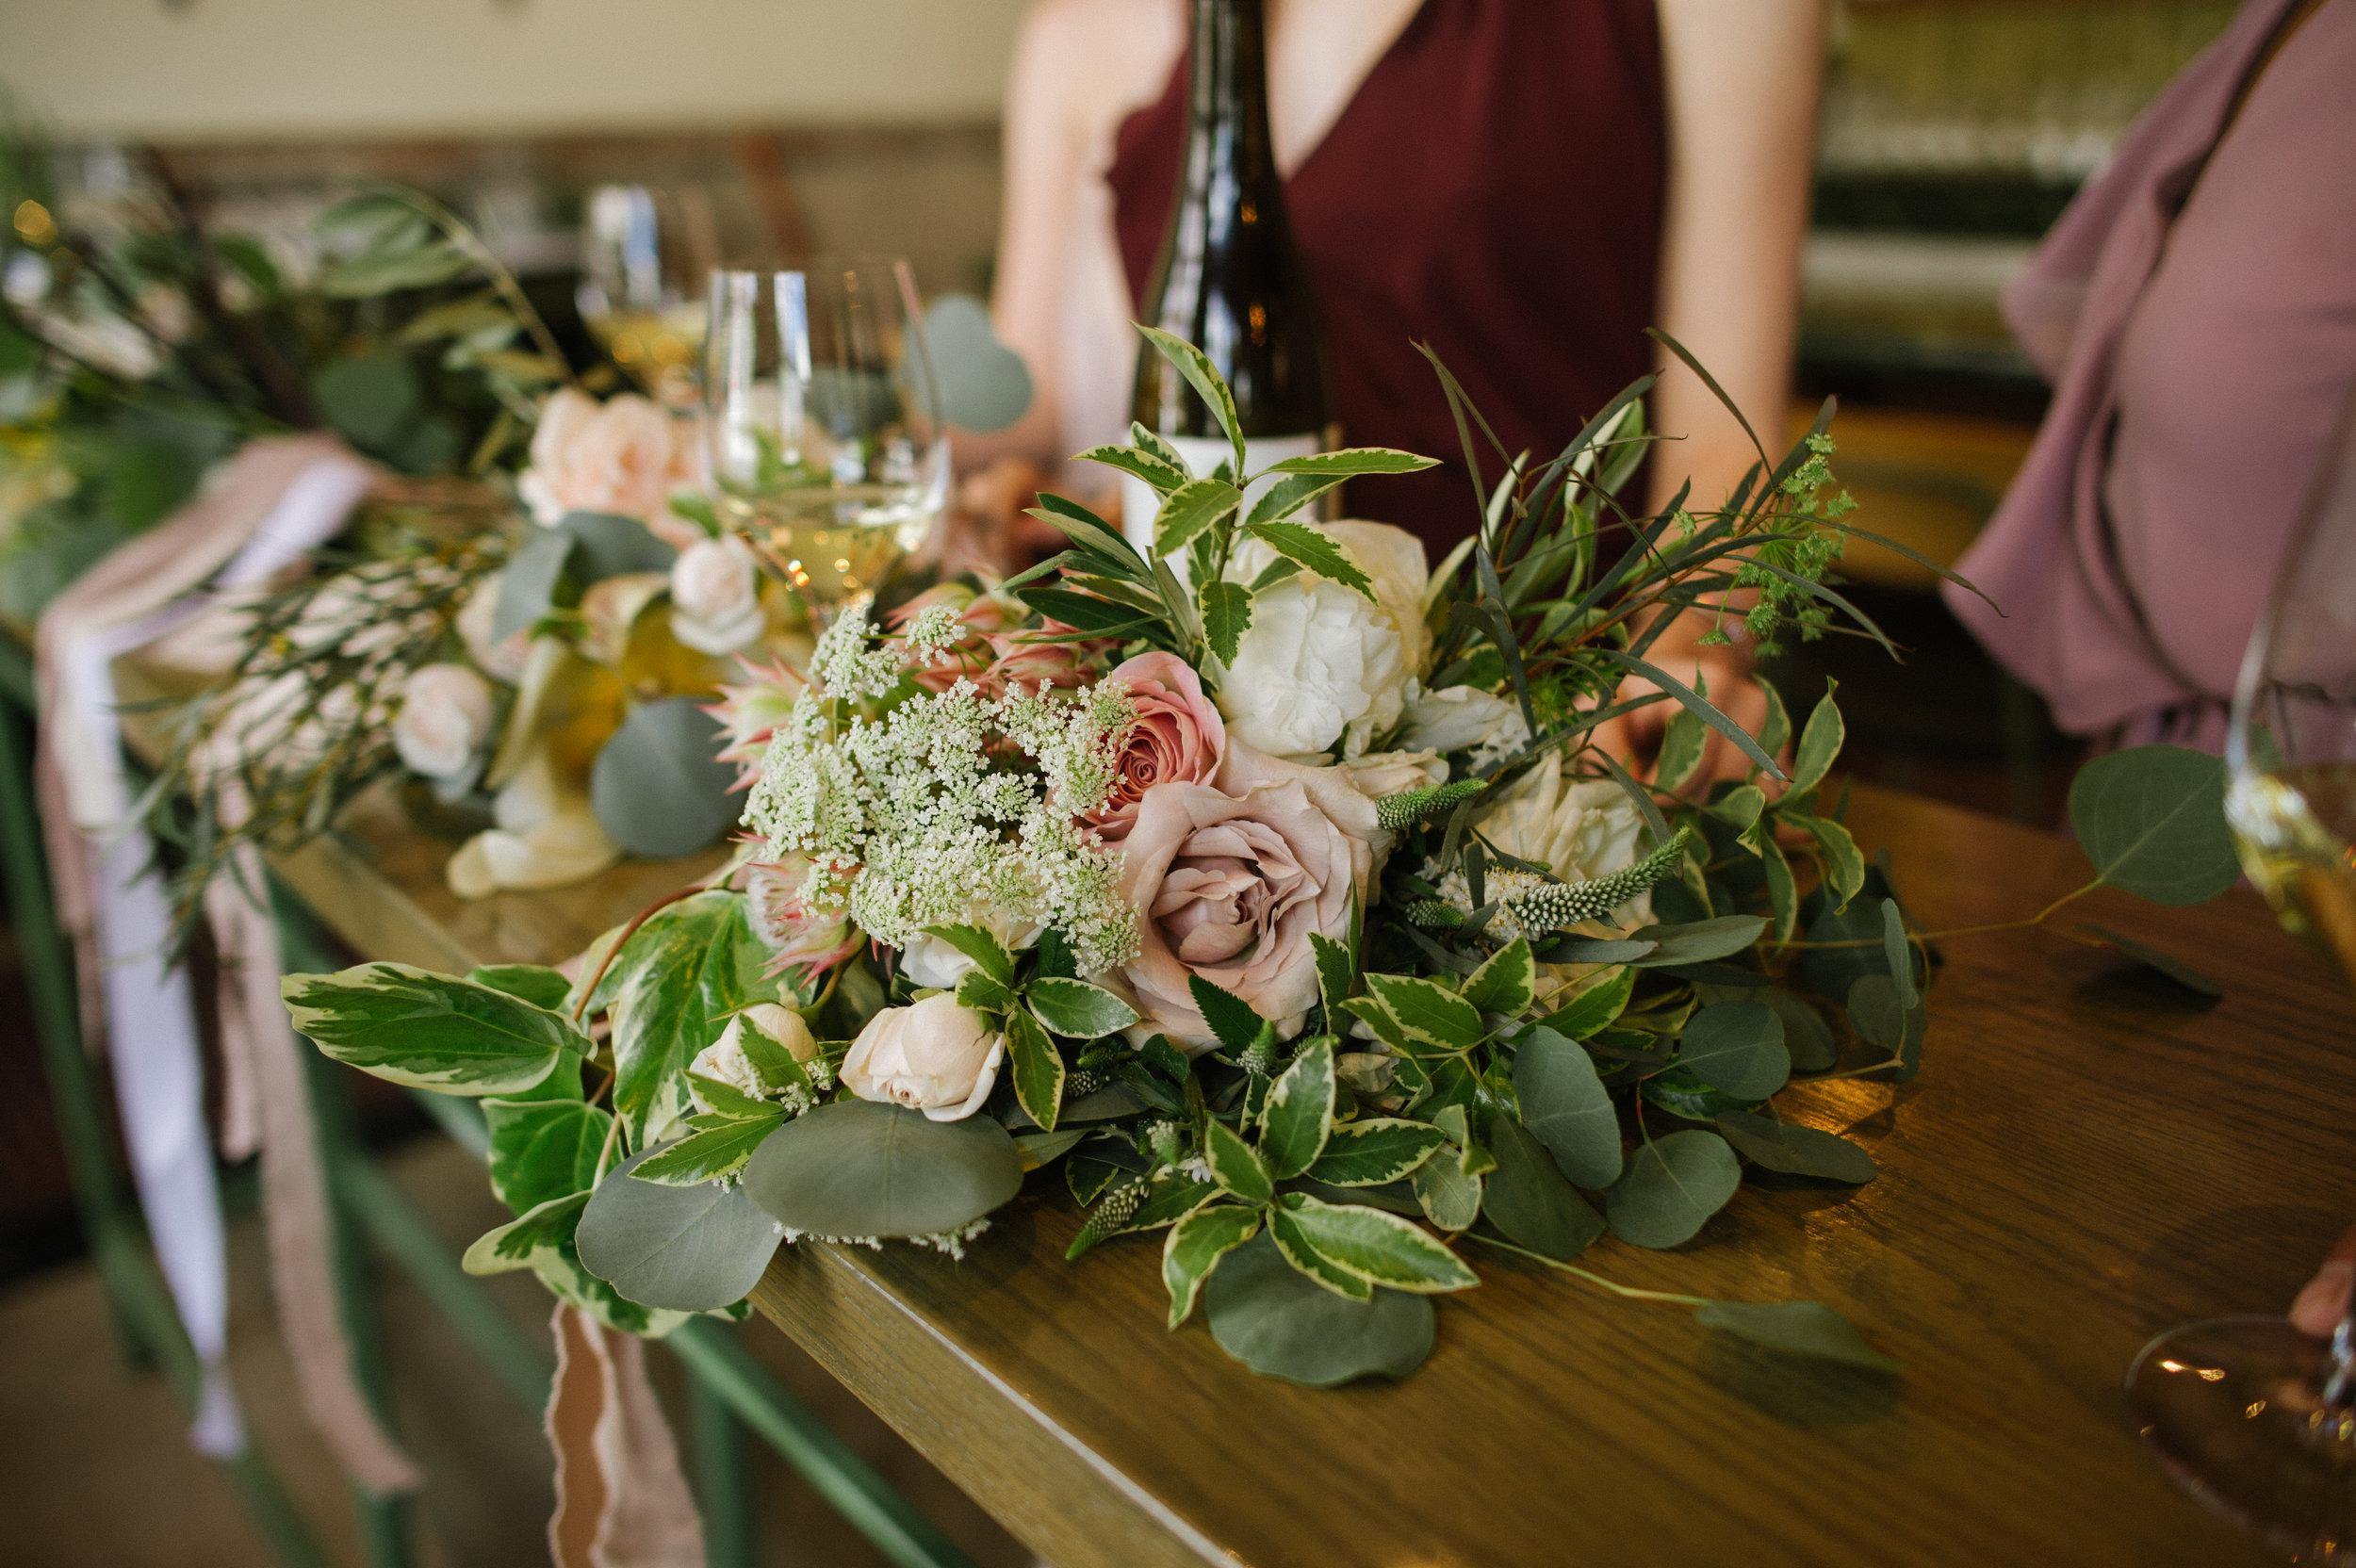 Calgary_Wedding_Photography_Bridgette_Bar_Bridesmaids_Shoot_2018_HR065.jpg